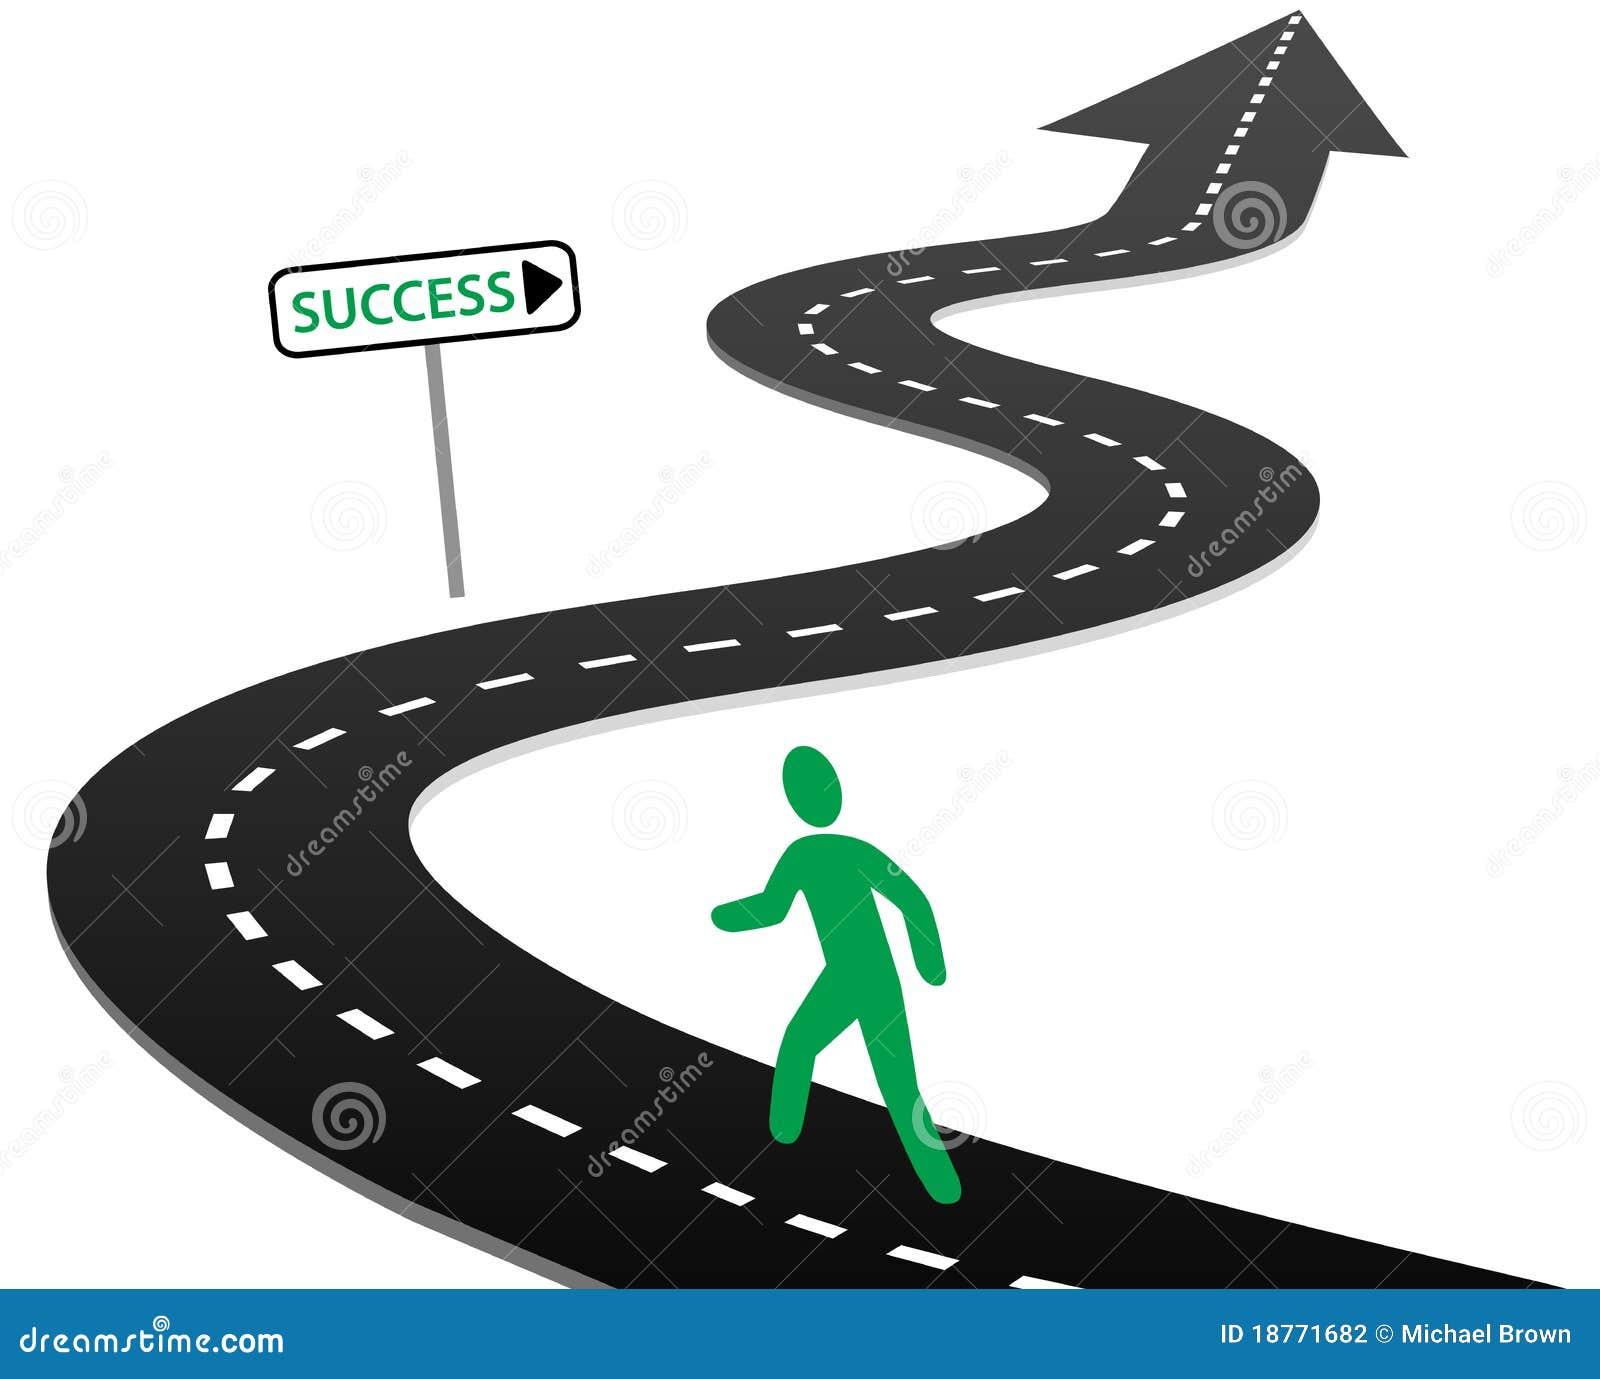 business roadmap clipart - photo #17